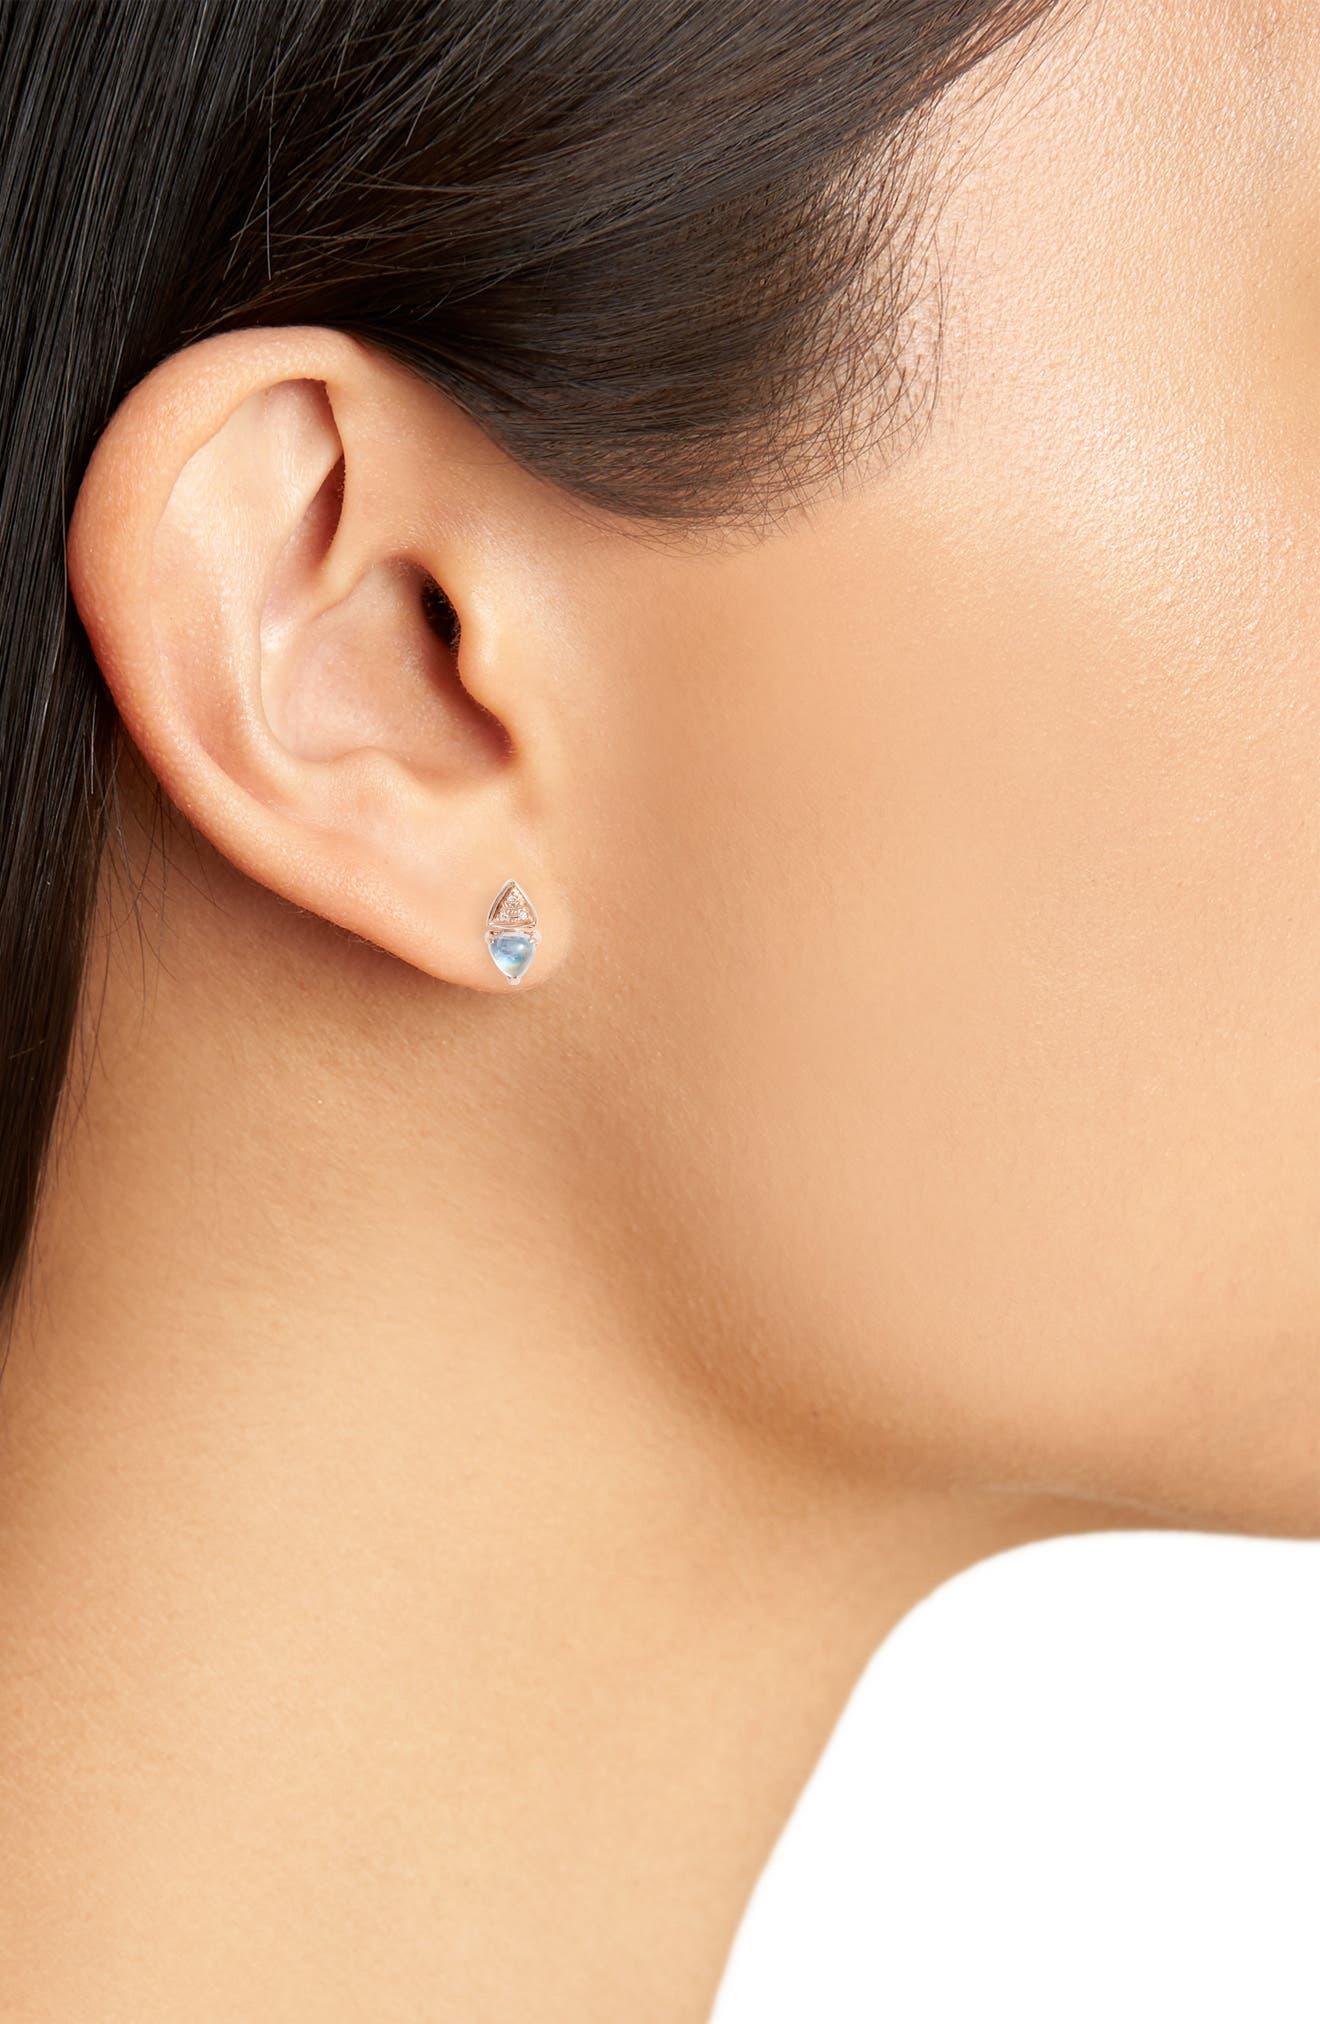 Diamond & Stone Stud Earrings,                             Alternate thumbnail 2, color,                             Rose Gold